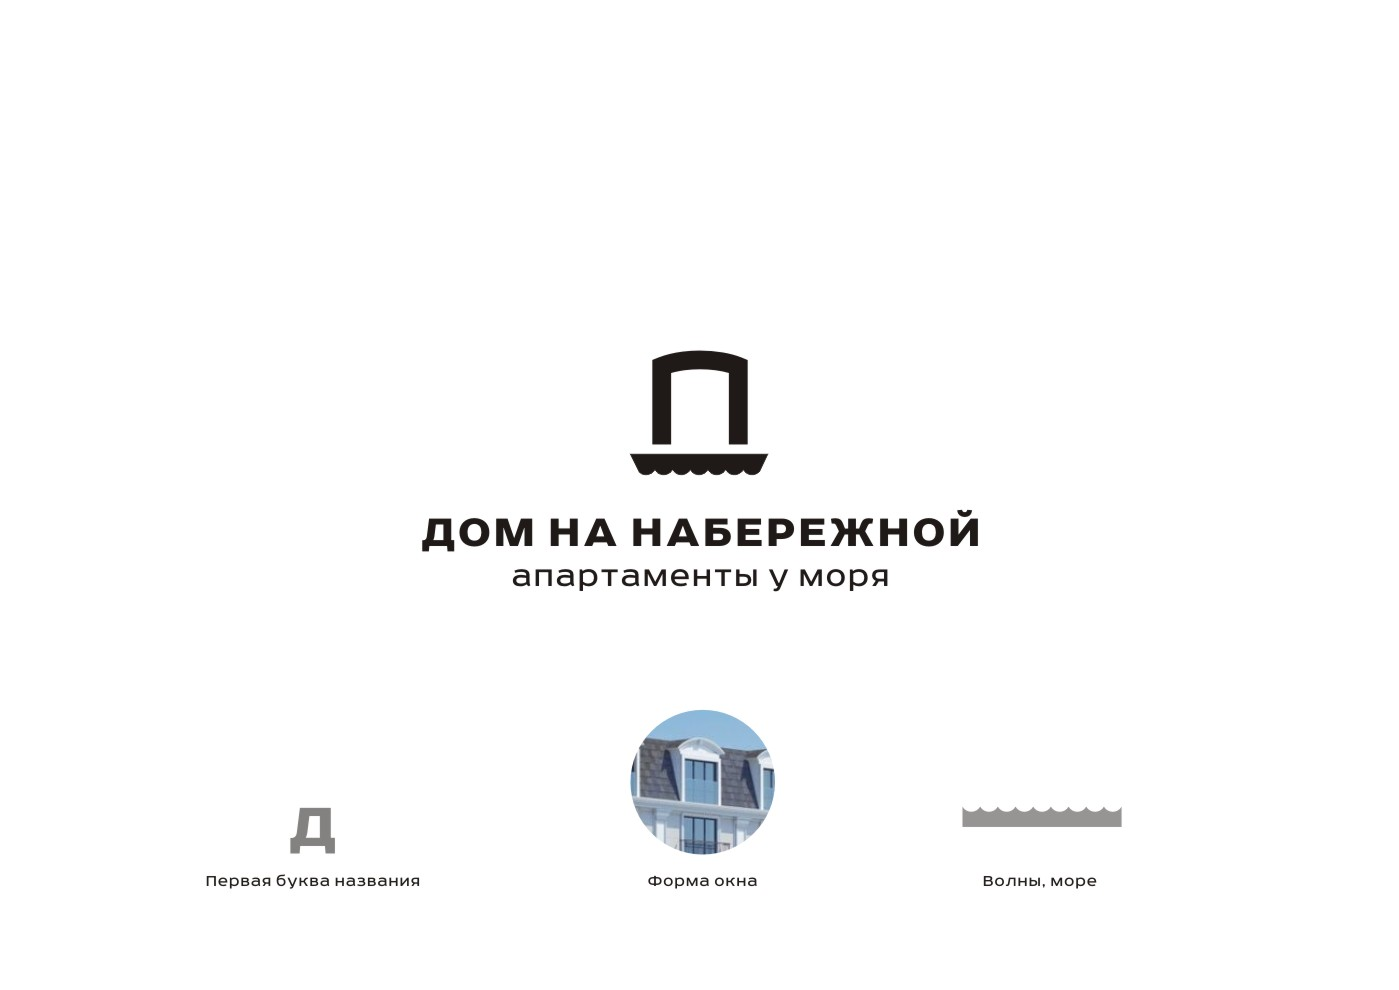 РАЗРАБОТКА логотипа для ЖИЛОГО КОМПЛЕКСА премиум В АНАПЕ.  фото f_1125de77537e6615.jpg